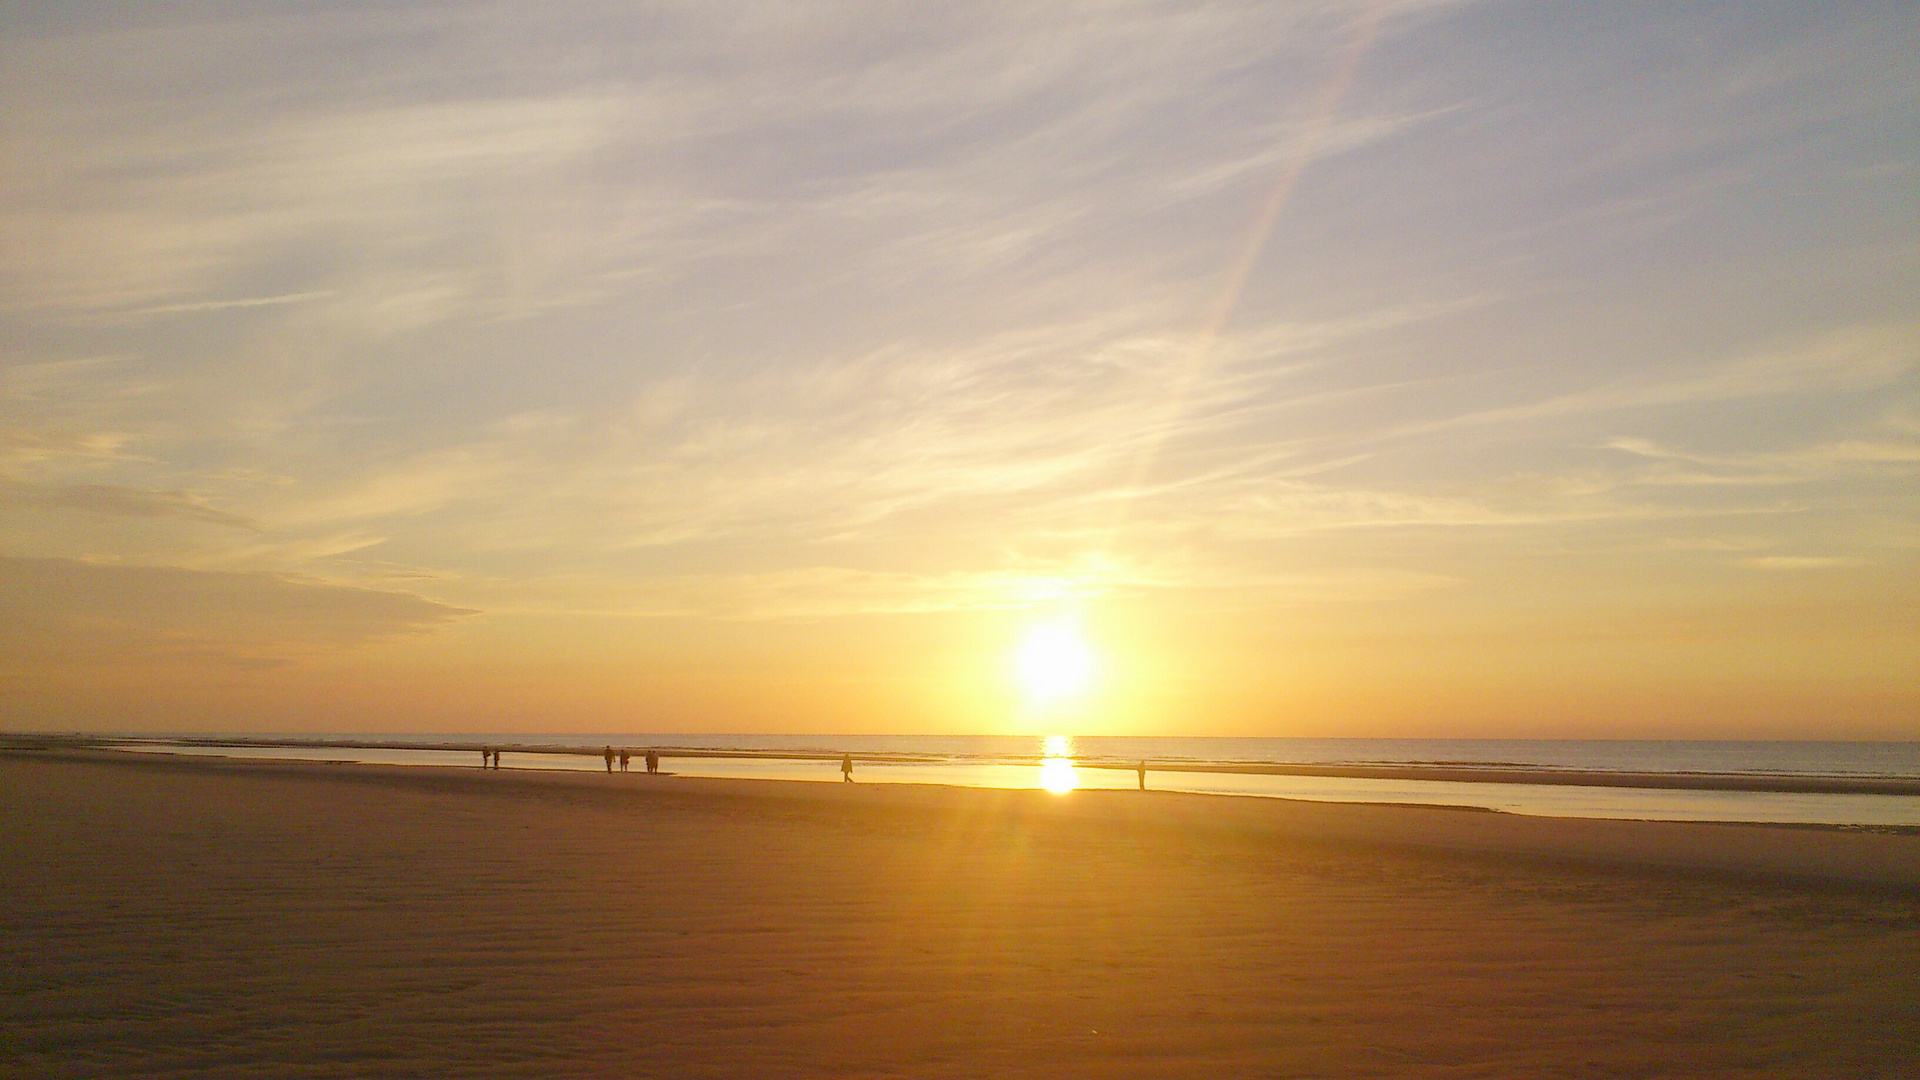 Sonnenuntergang am Strand [1]